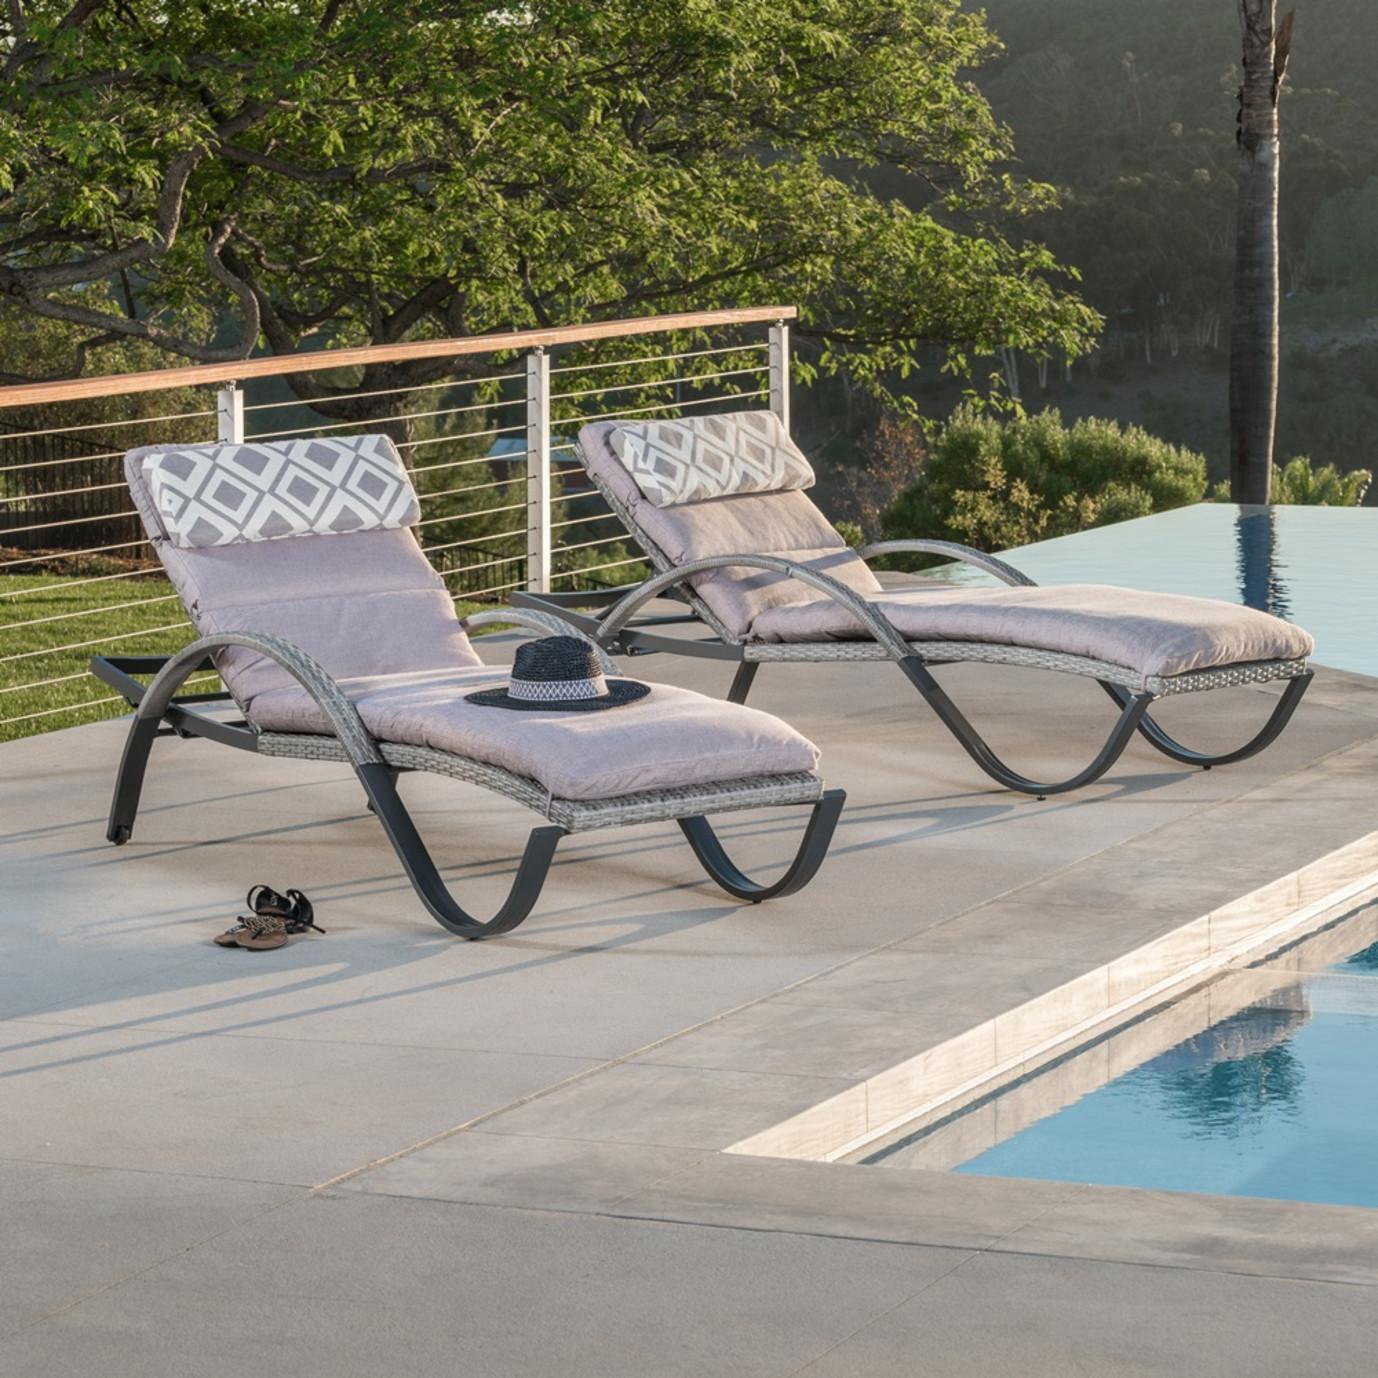 Cannes™ 20pc Outdoor Estate Set - Wisteria Lavender